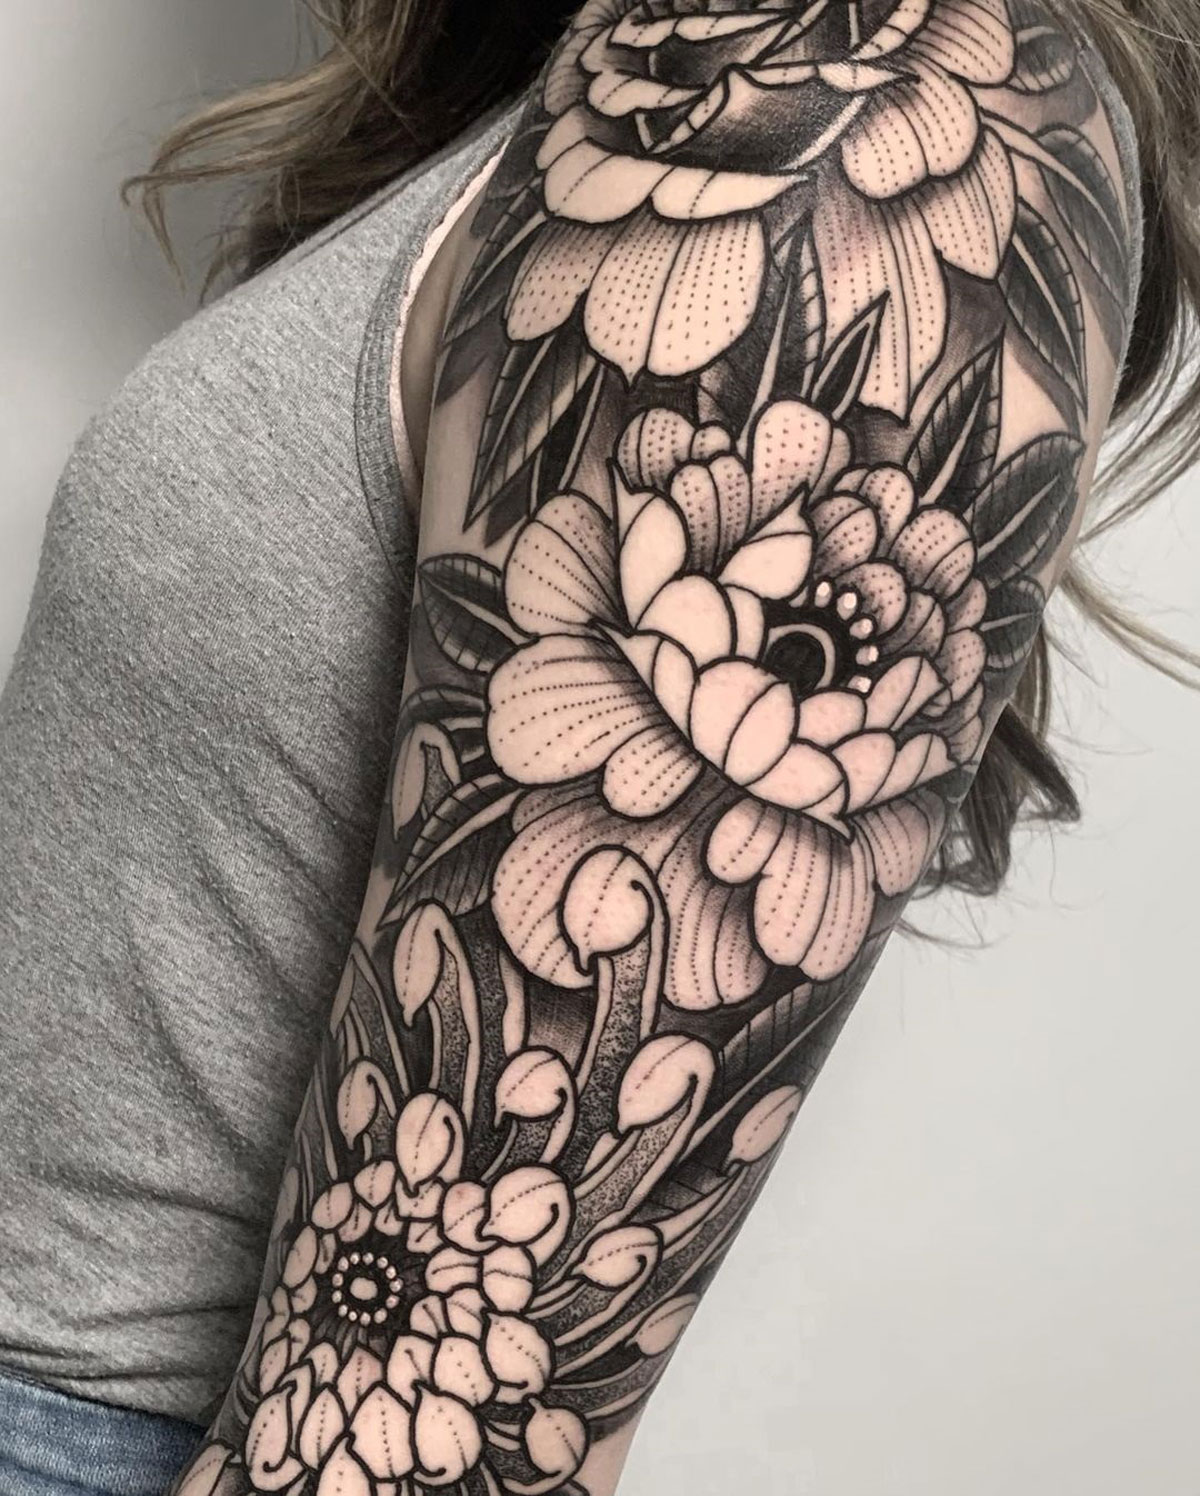 Floral sleeve detail